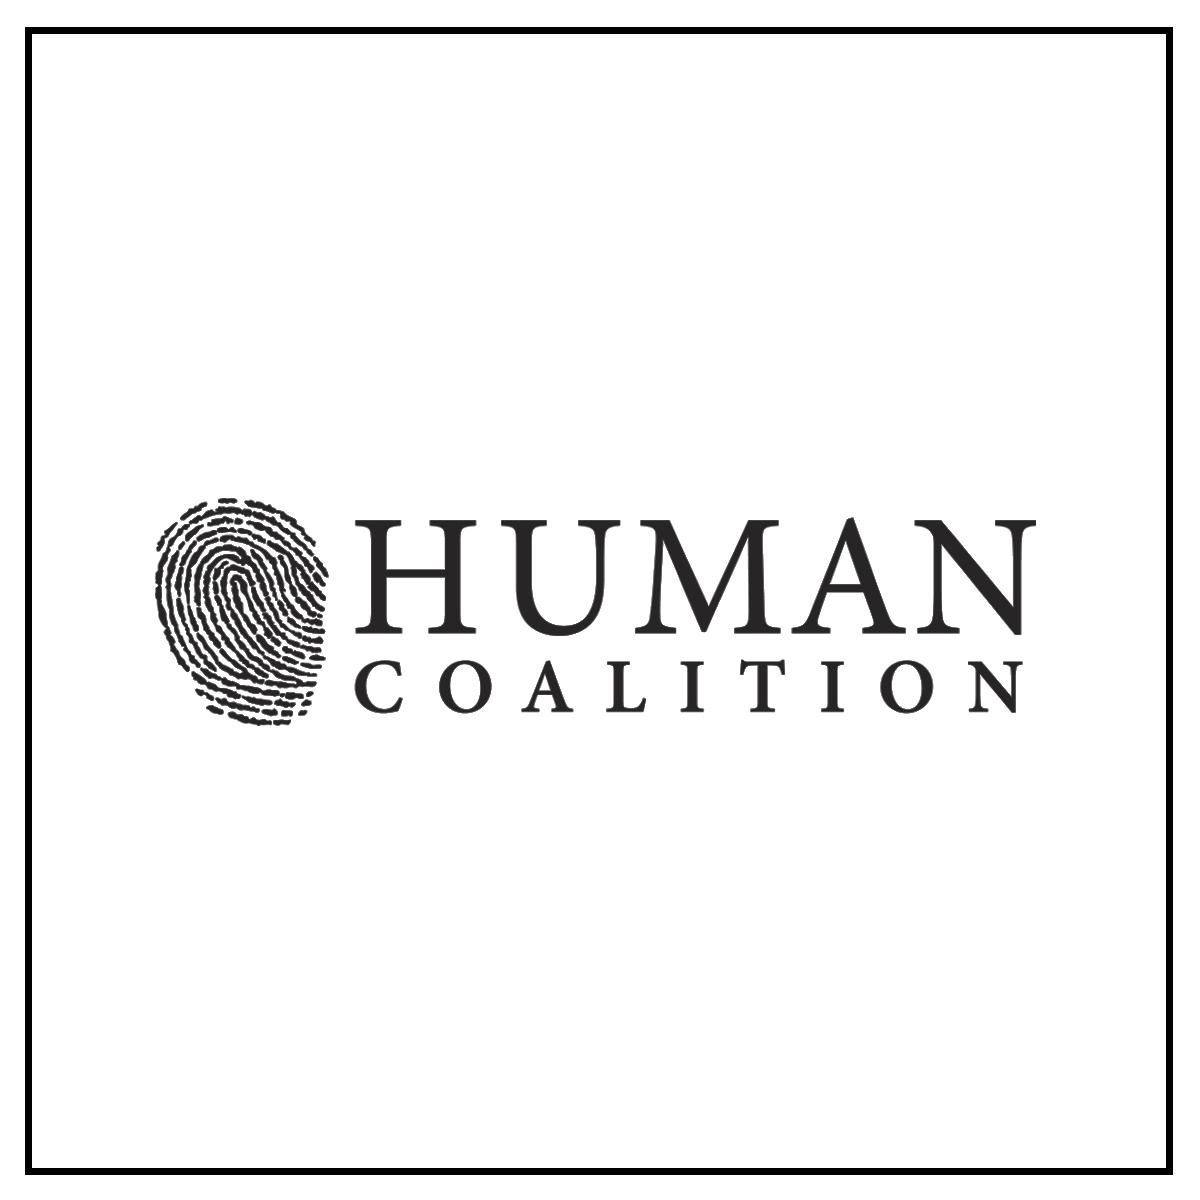 Human Coalition Logo B+W Square.jpg